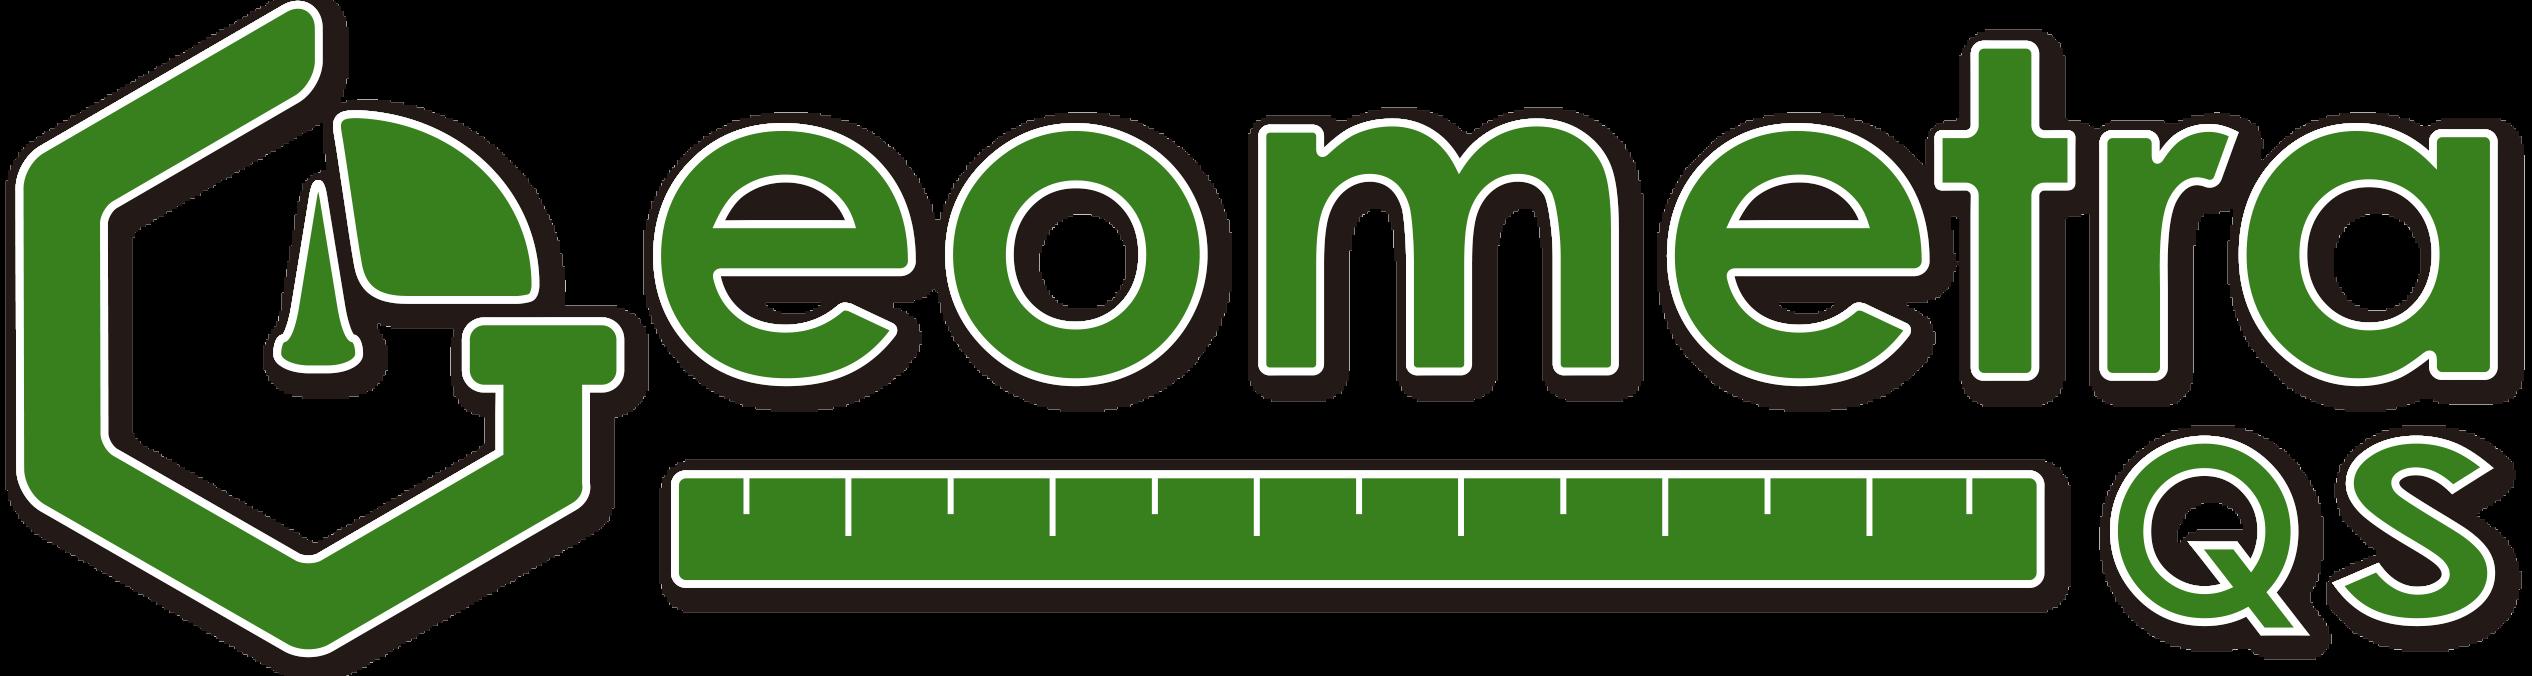 Geometra QS